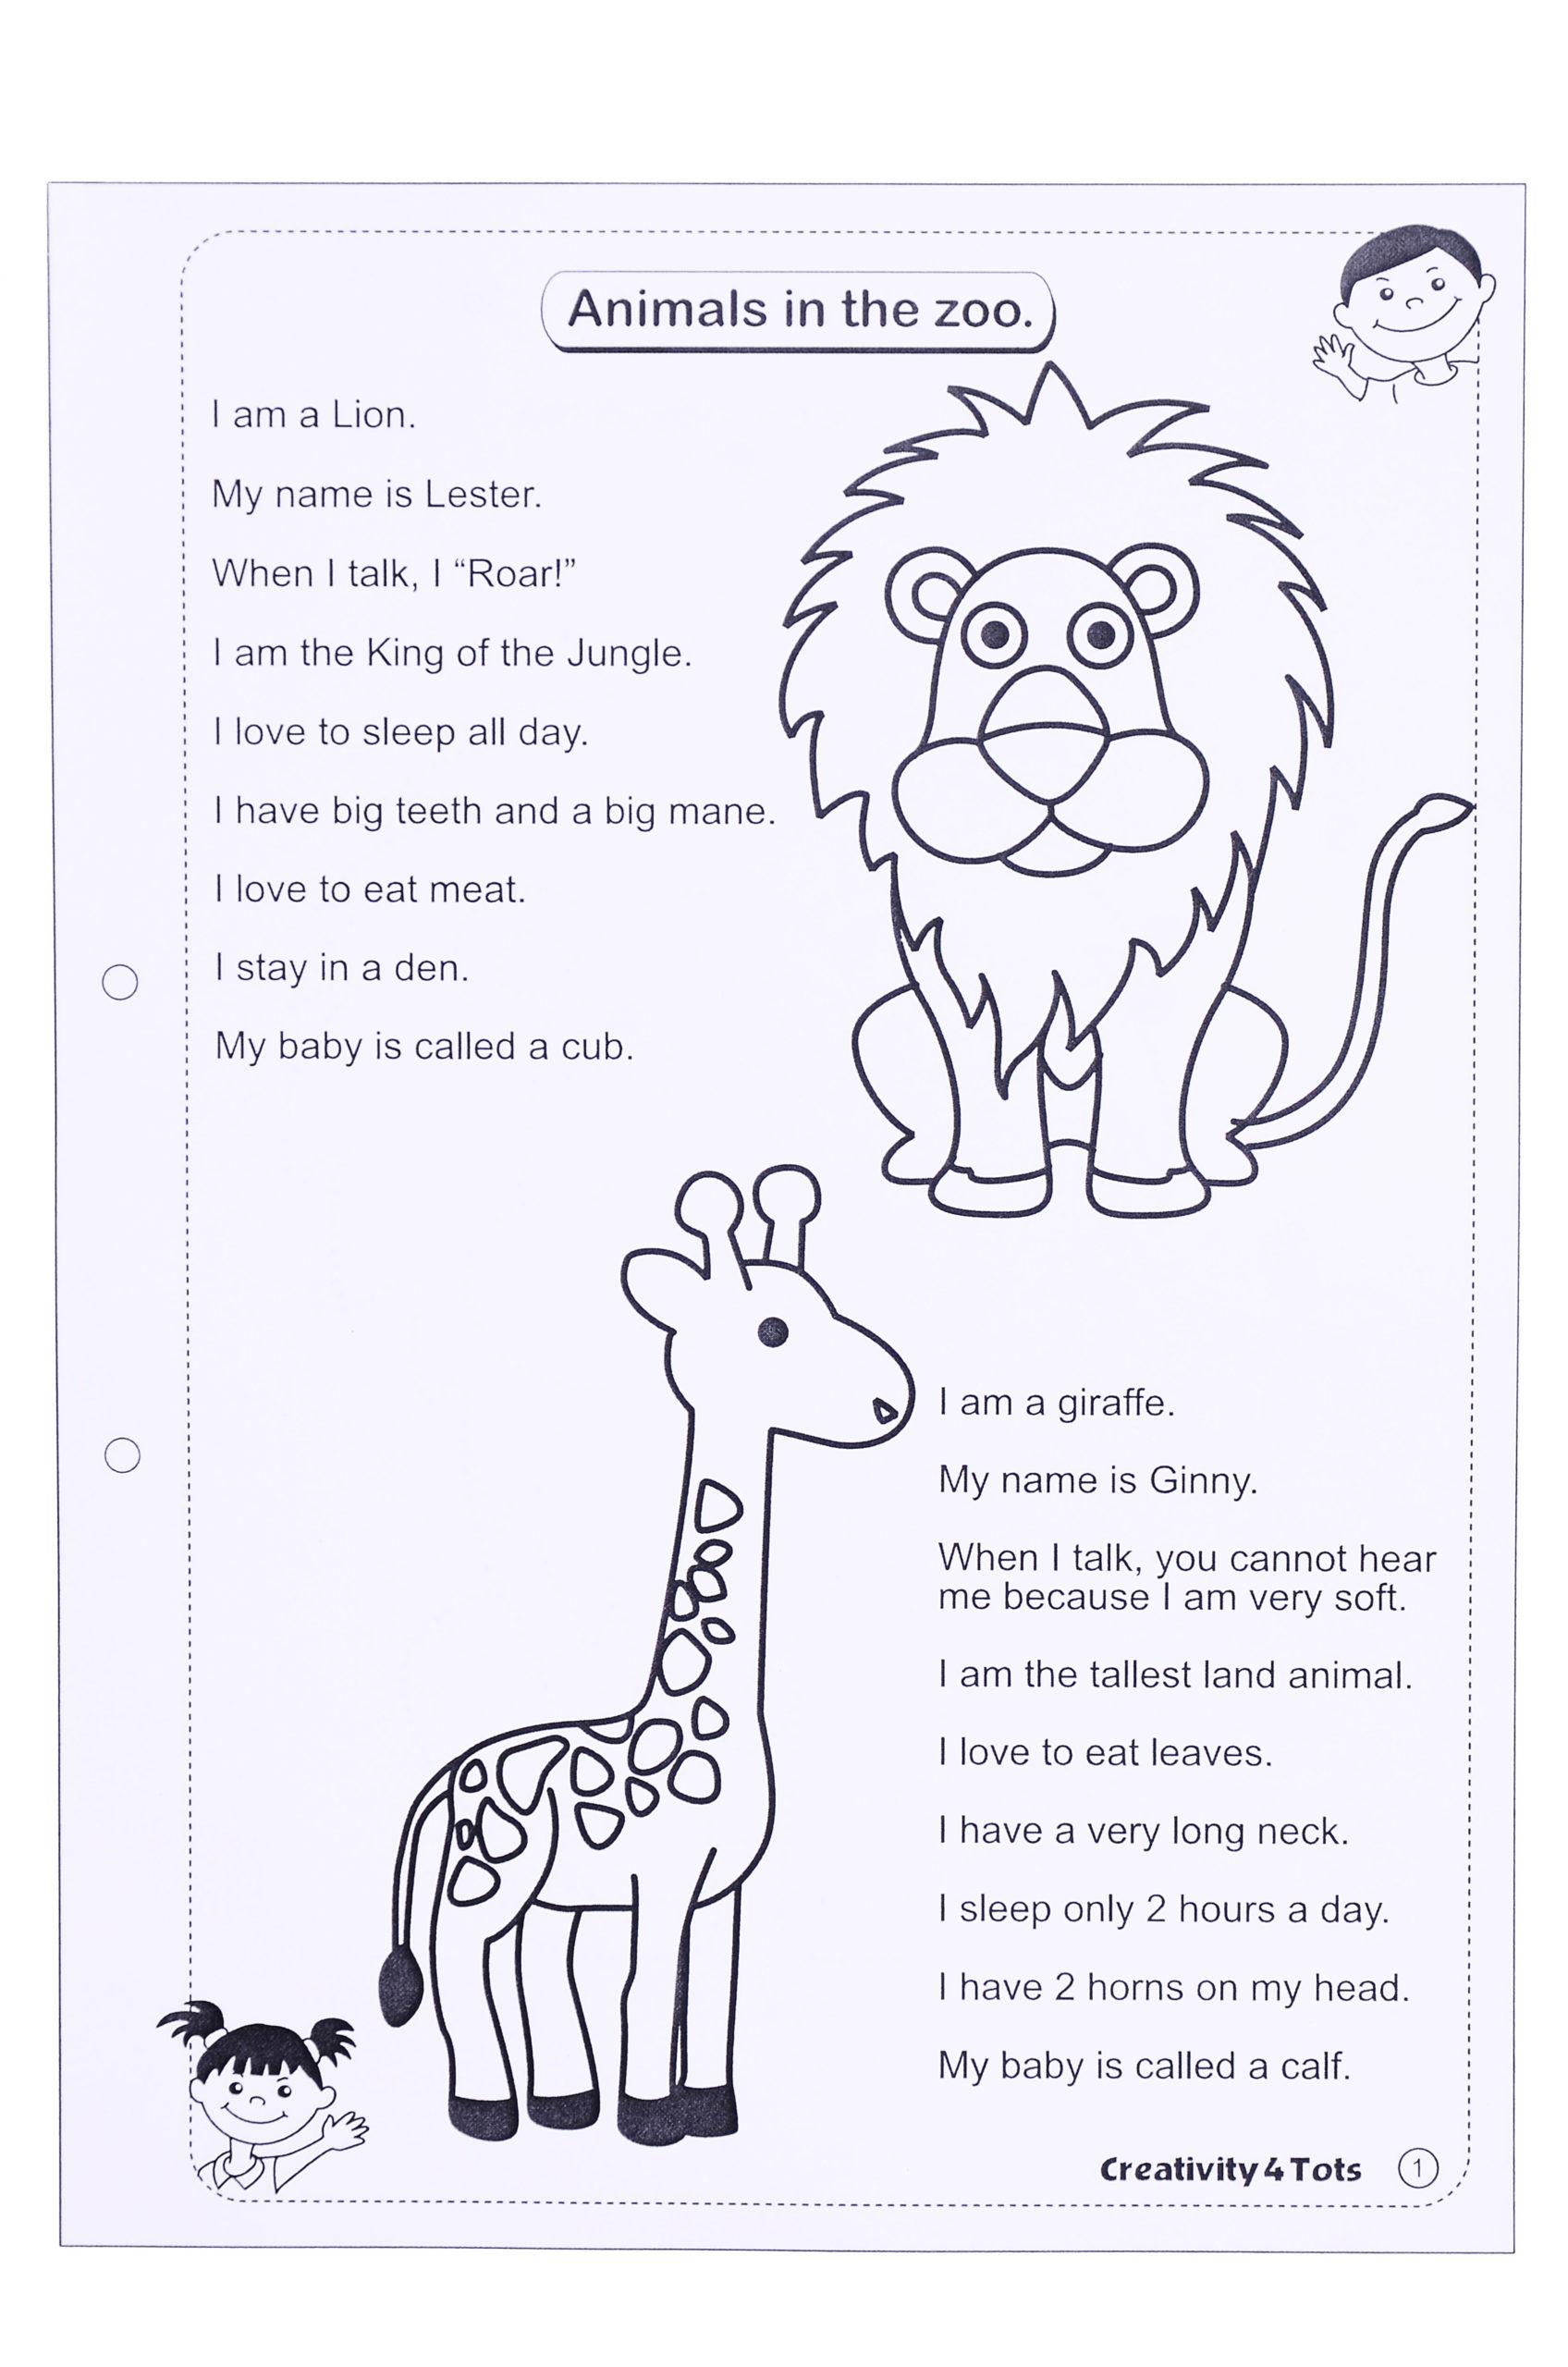 Zoo Animals Worksheet - This Worksheet Is Designed To Teach